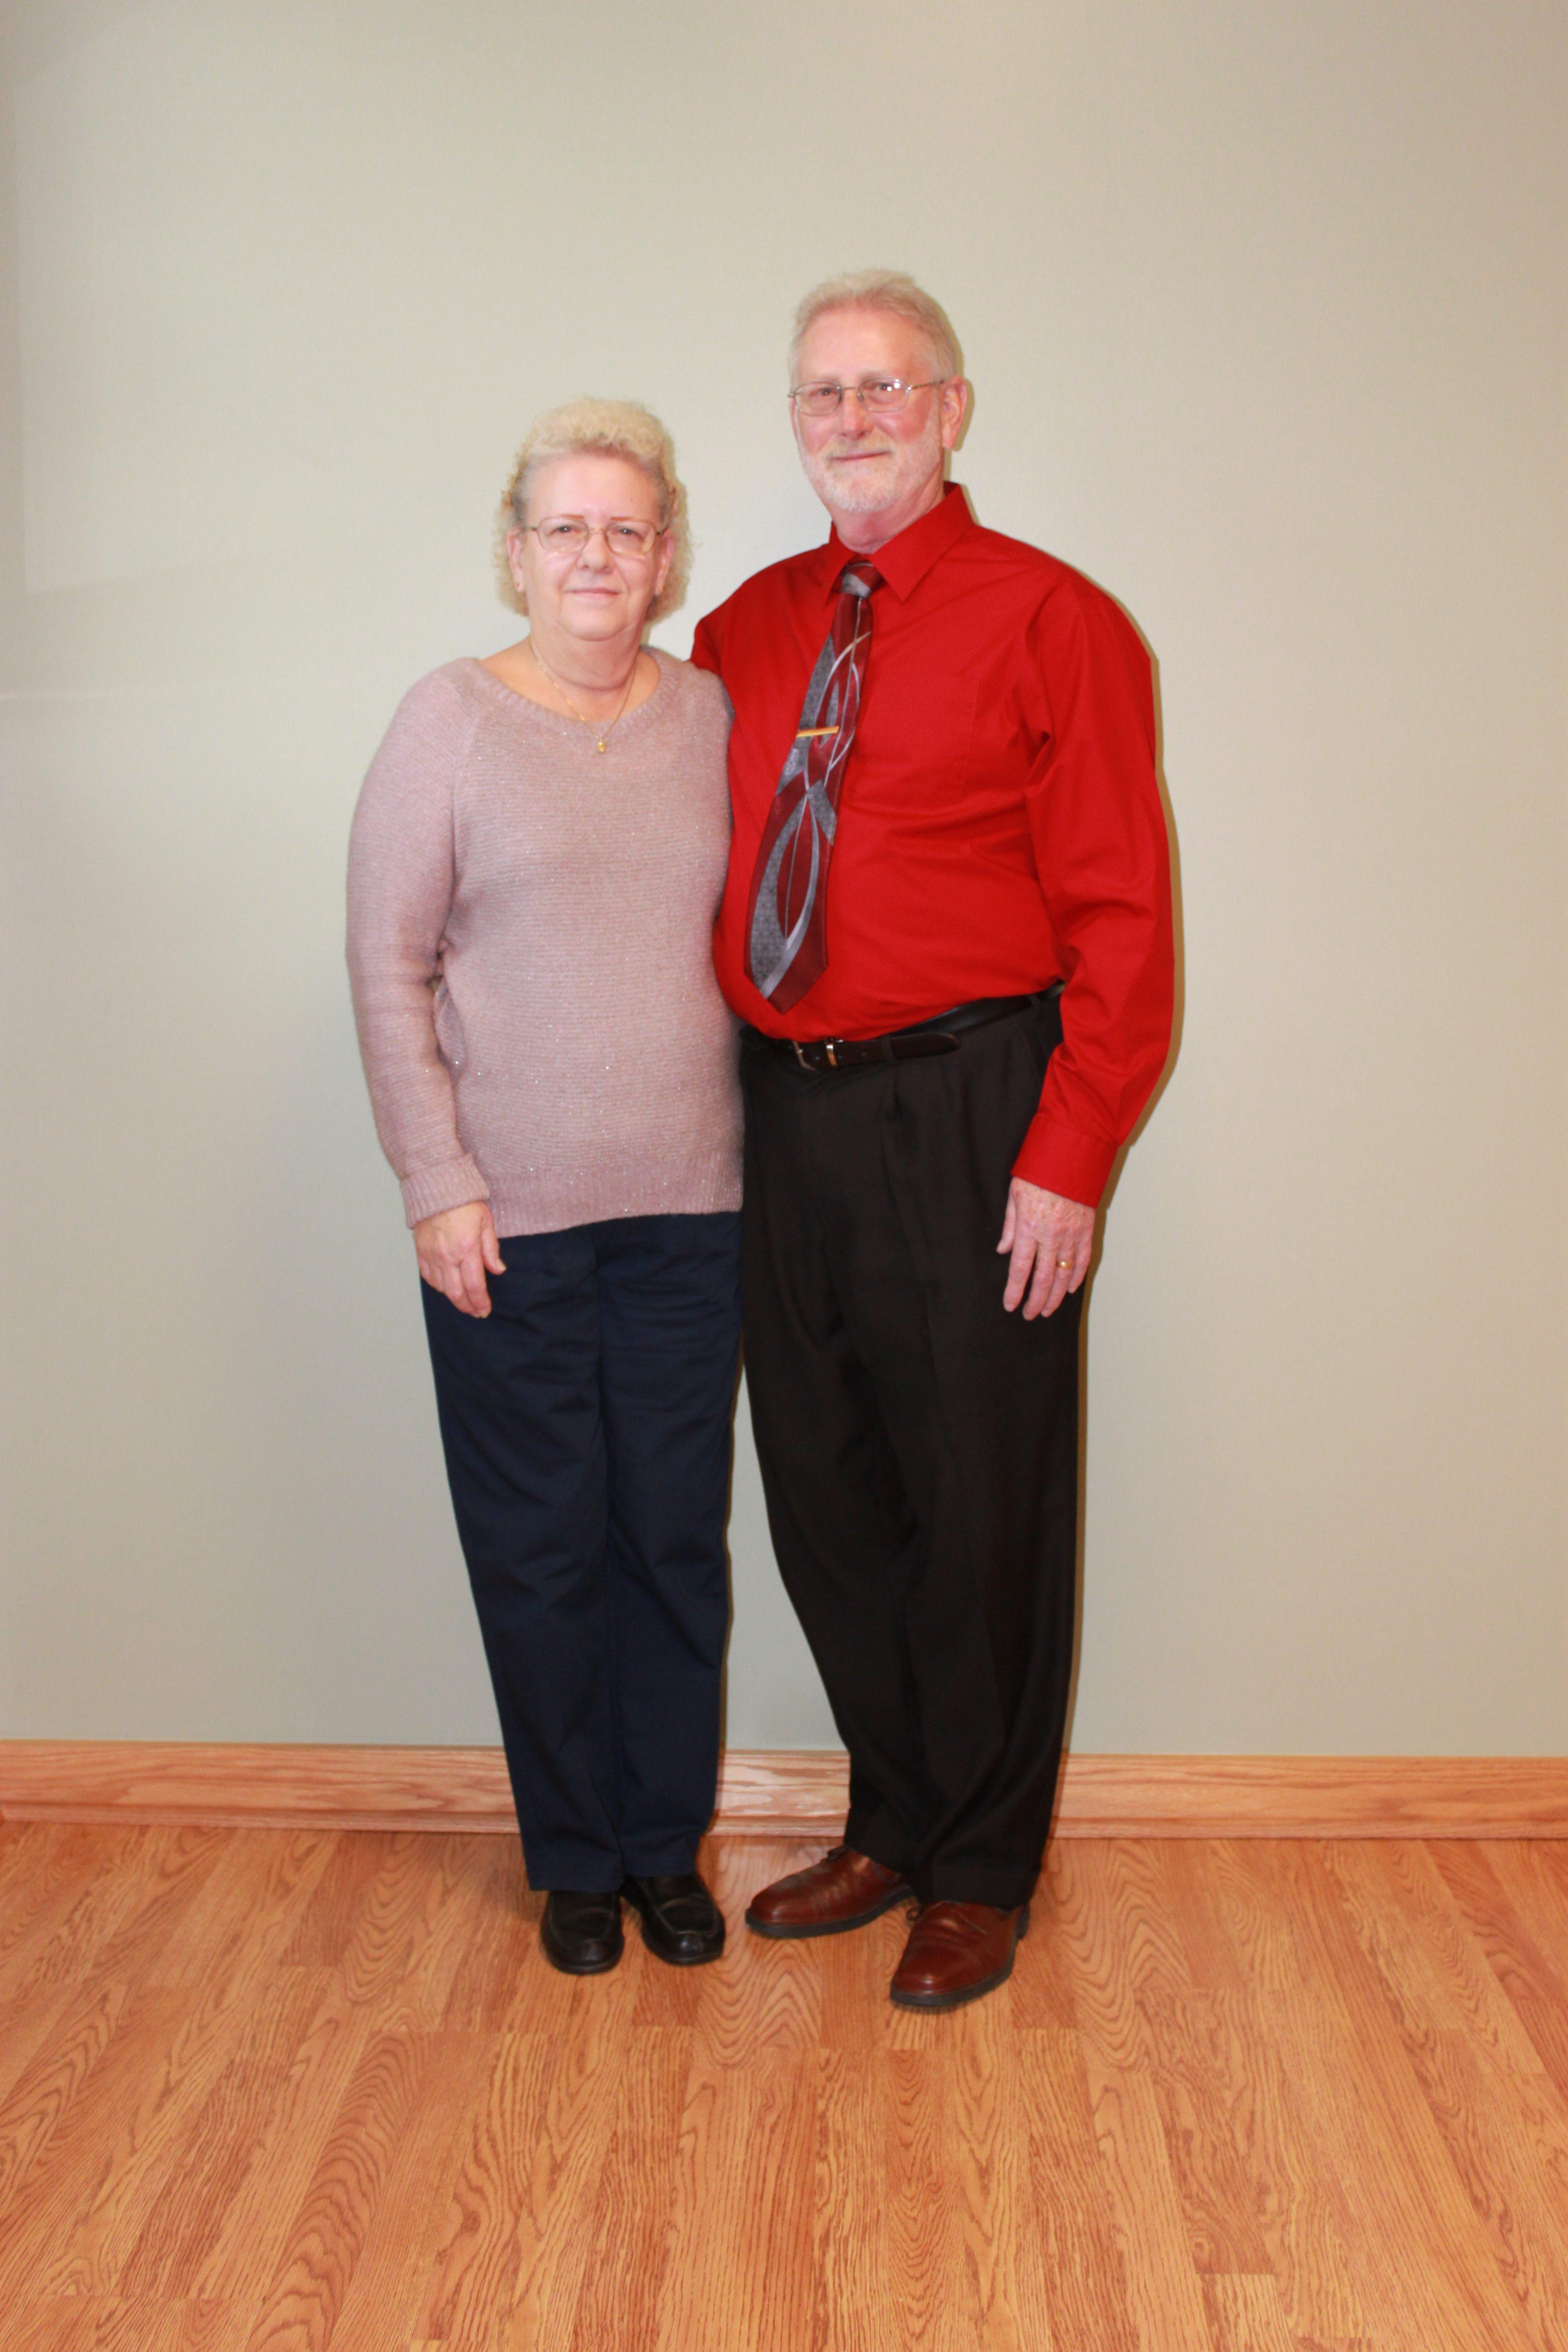 Scott & Laura McFarland